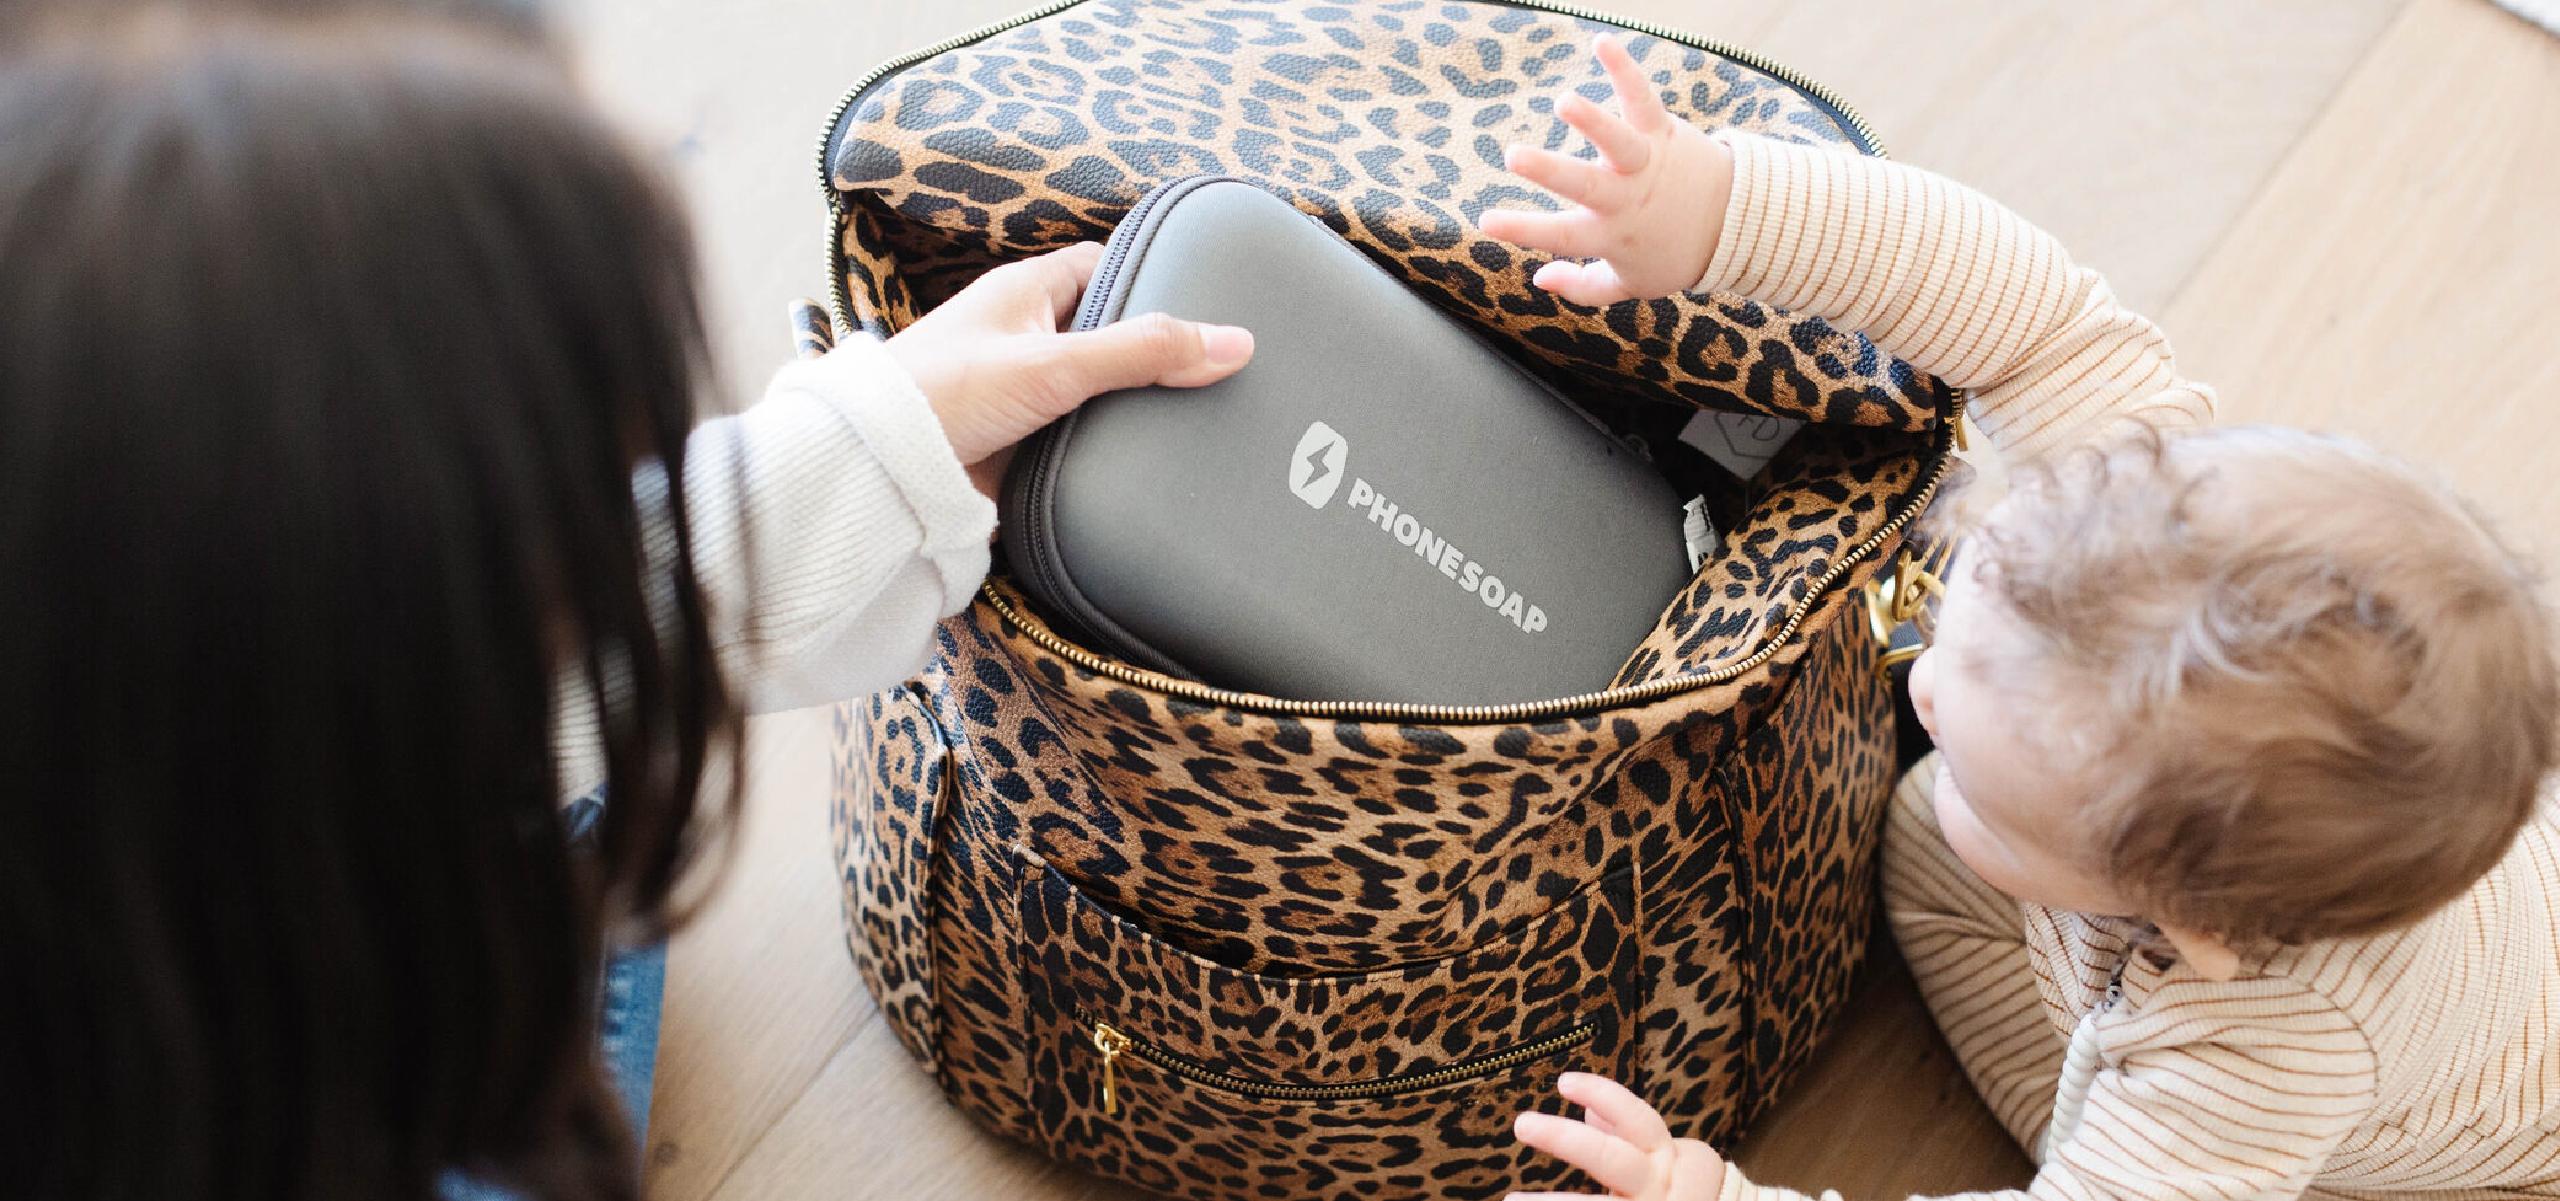 PhoneSoap Go in handbag